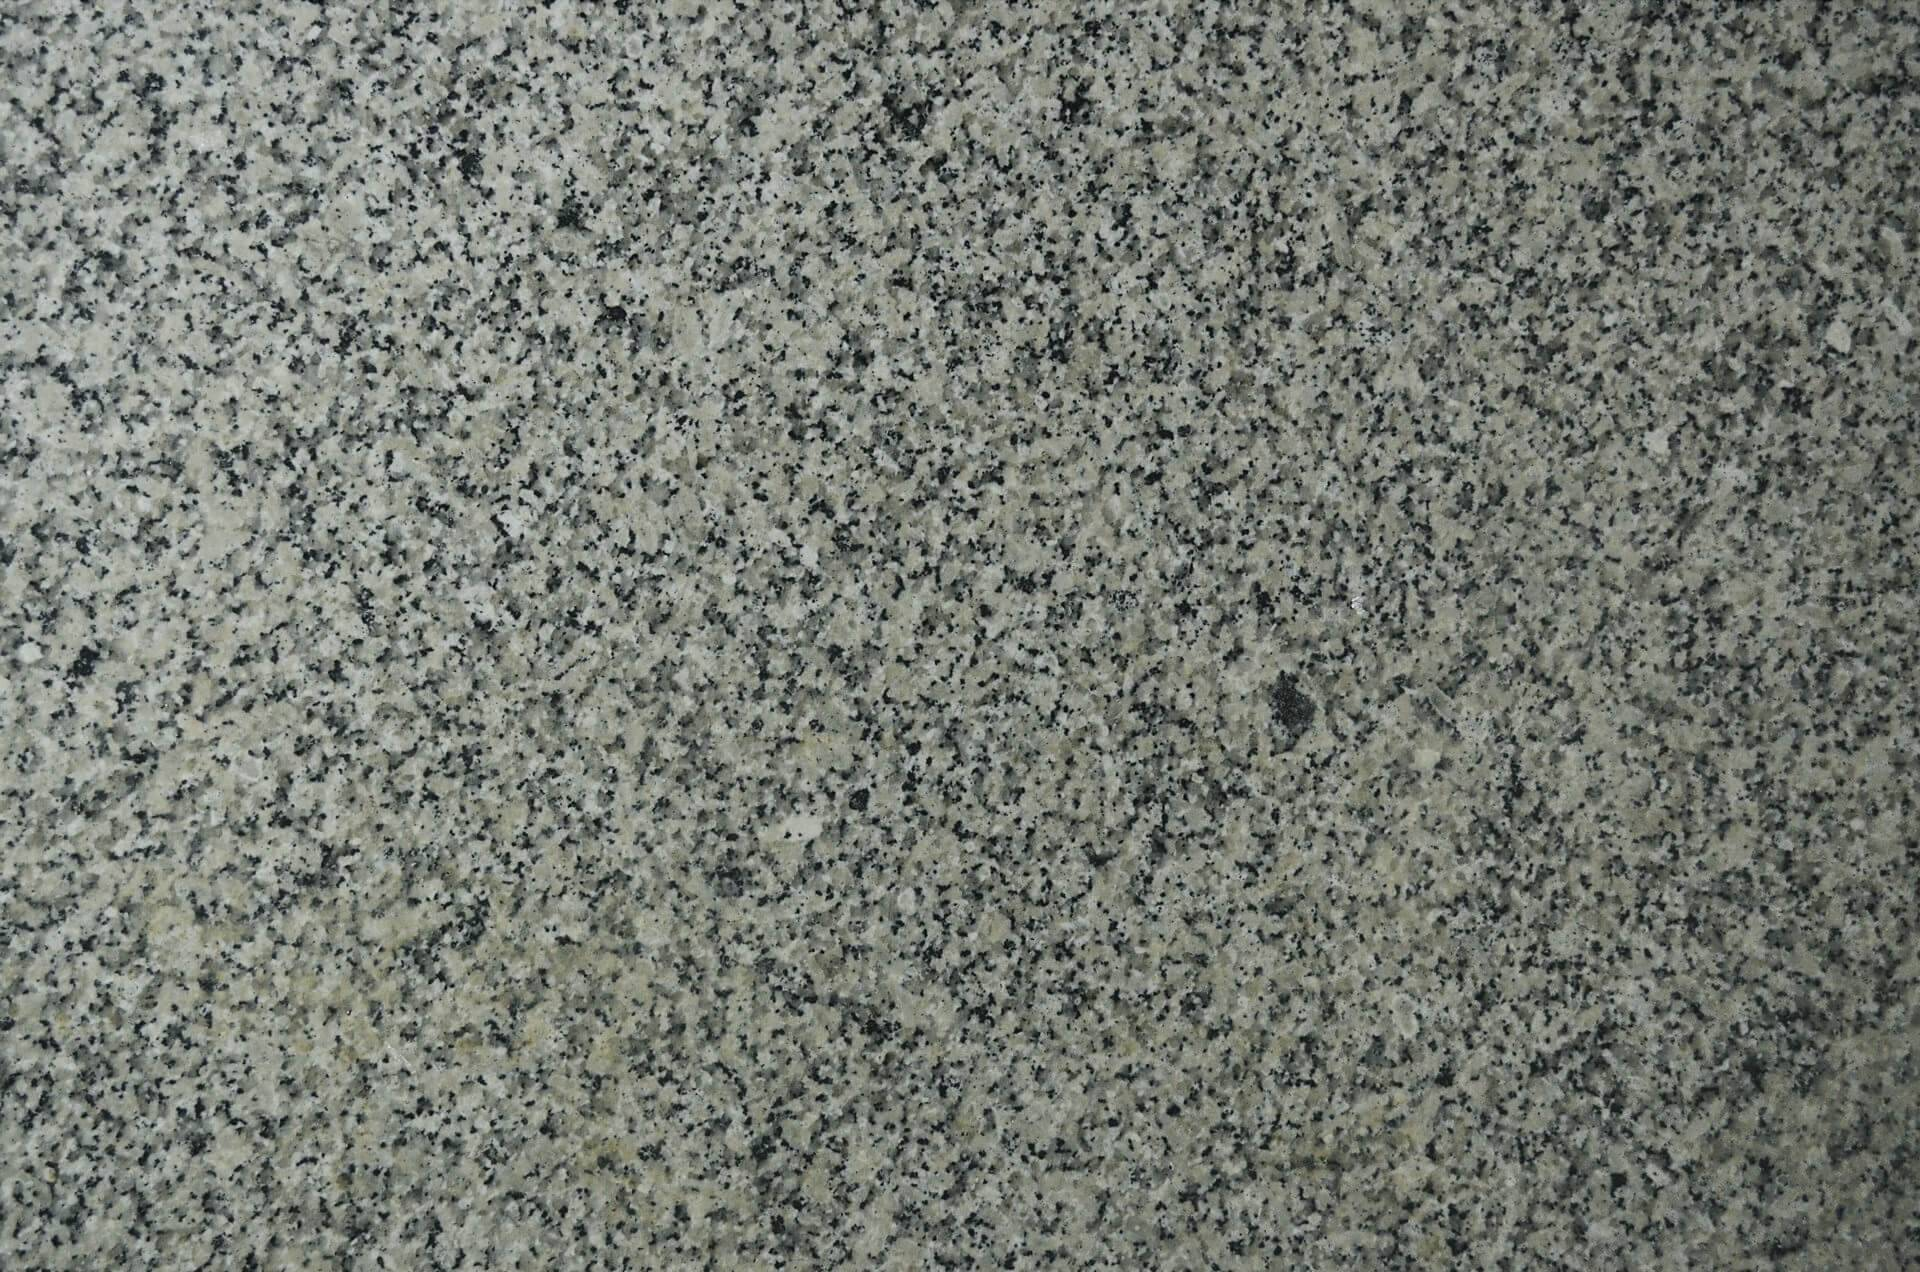 Bevers White Pearl фото 1 — камень от Bevers Marmyr